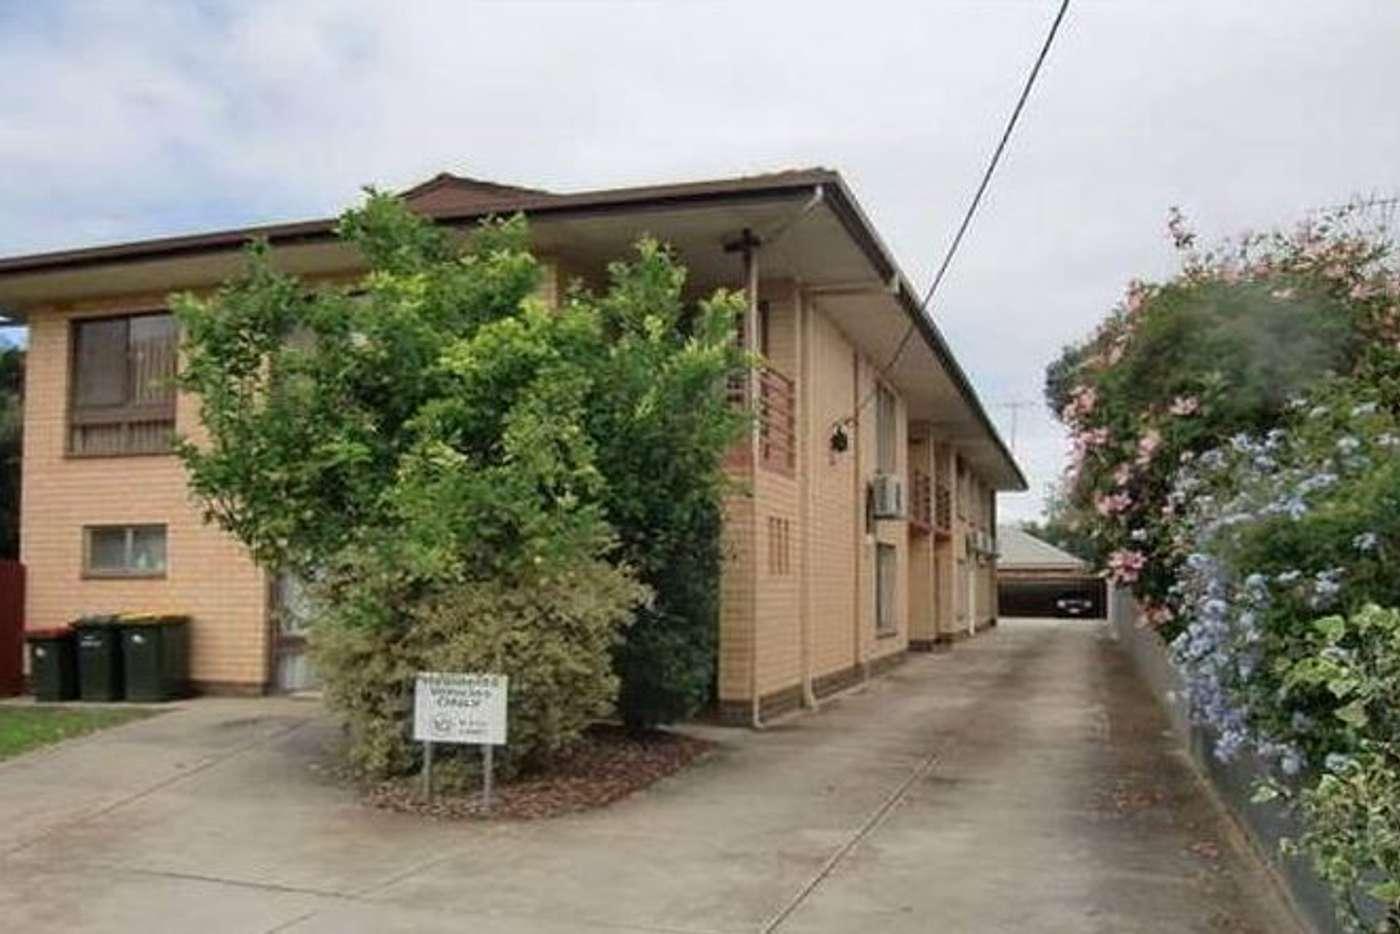 Main view of Homely unit listing, 6/38 MacFarlane Street, Glenelg North SA 5045